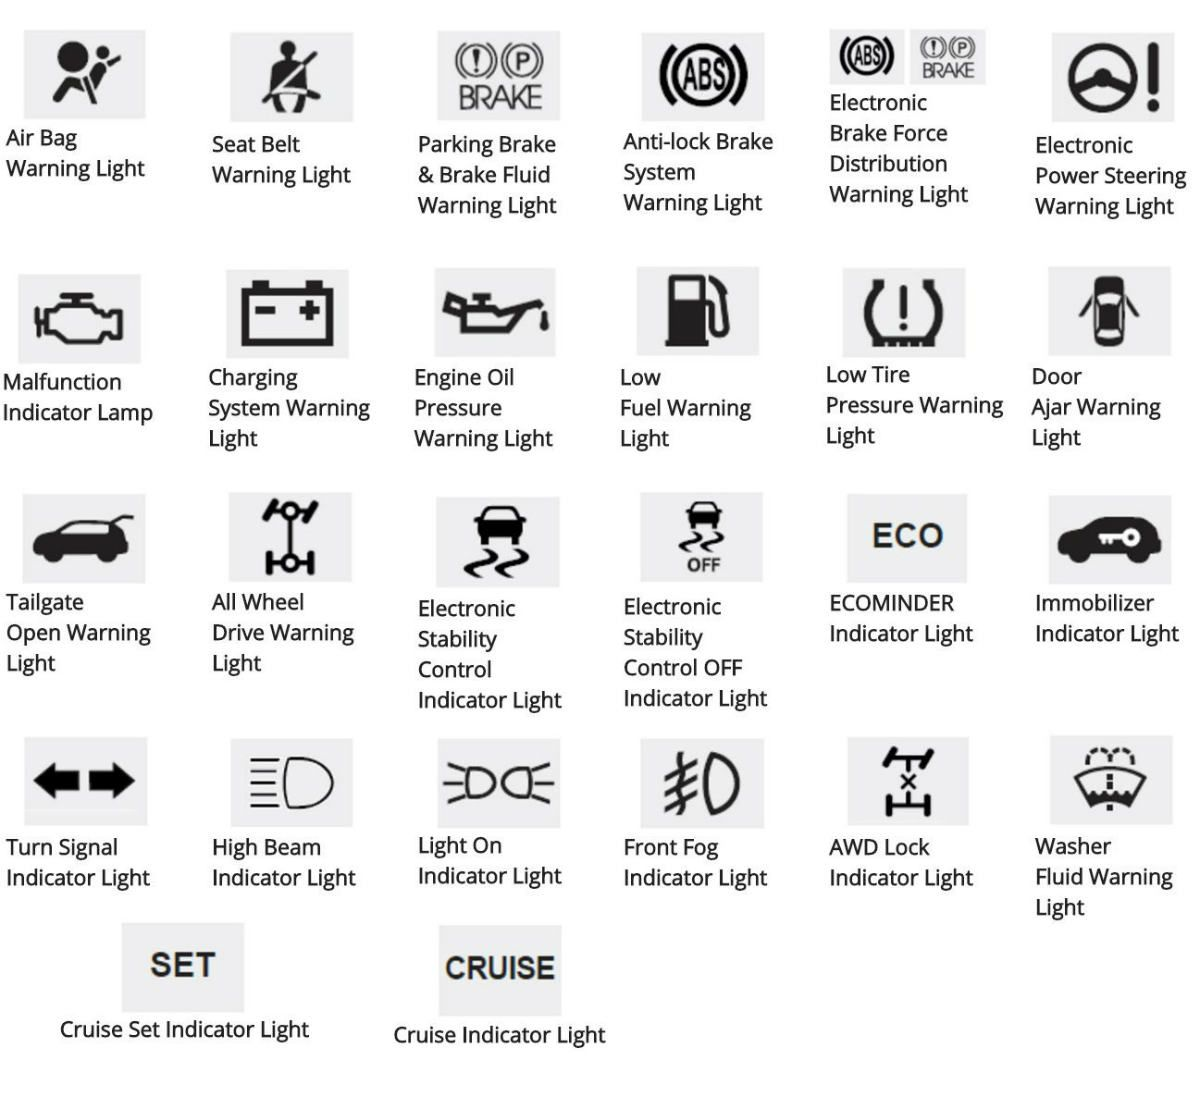 Kia Dashboard Warning Light Guide Warning Lights Kia Lighting Guide